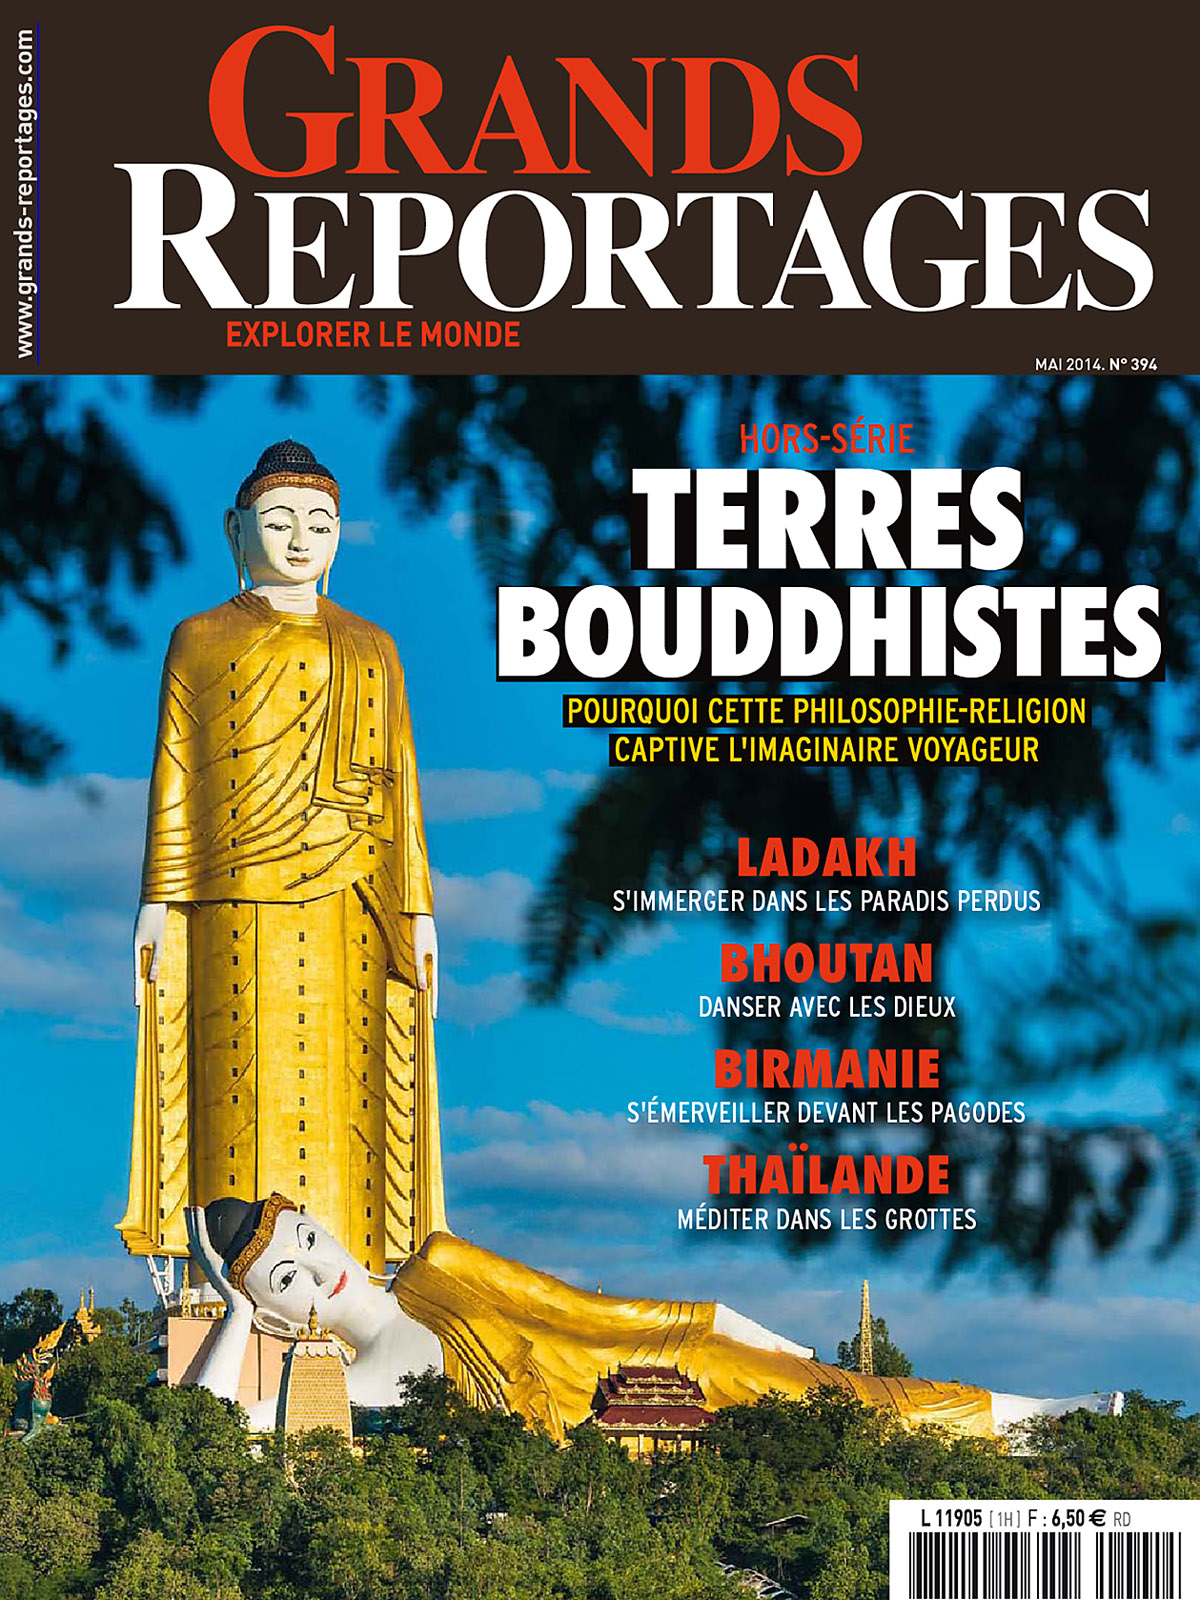 Grands Reportages 394 2014-05 01.jpg